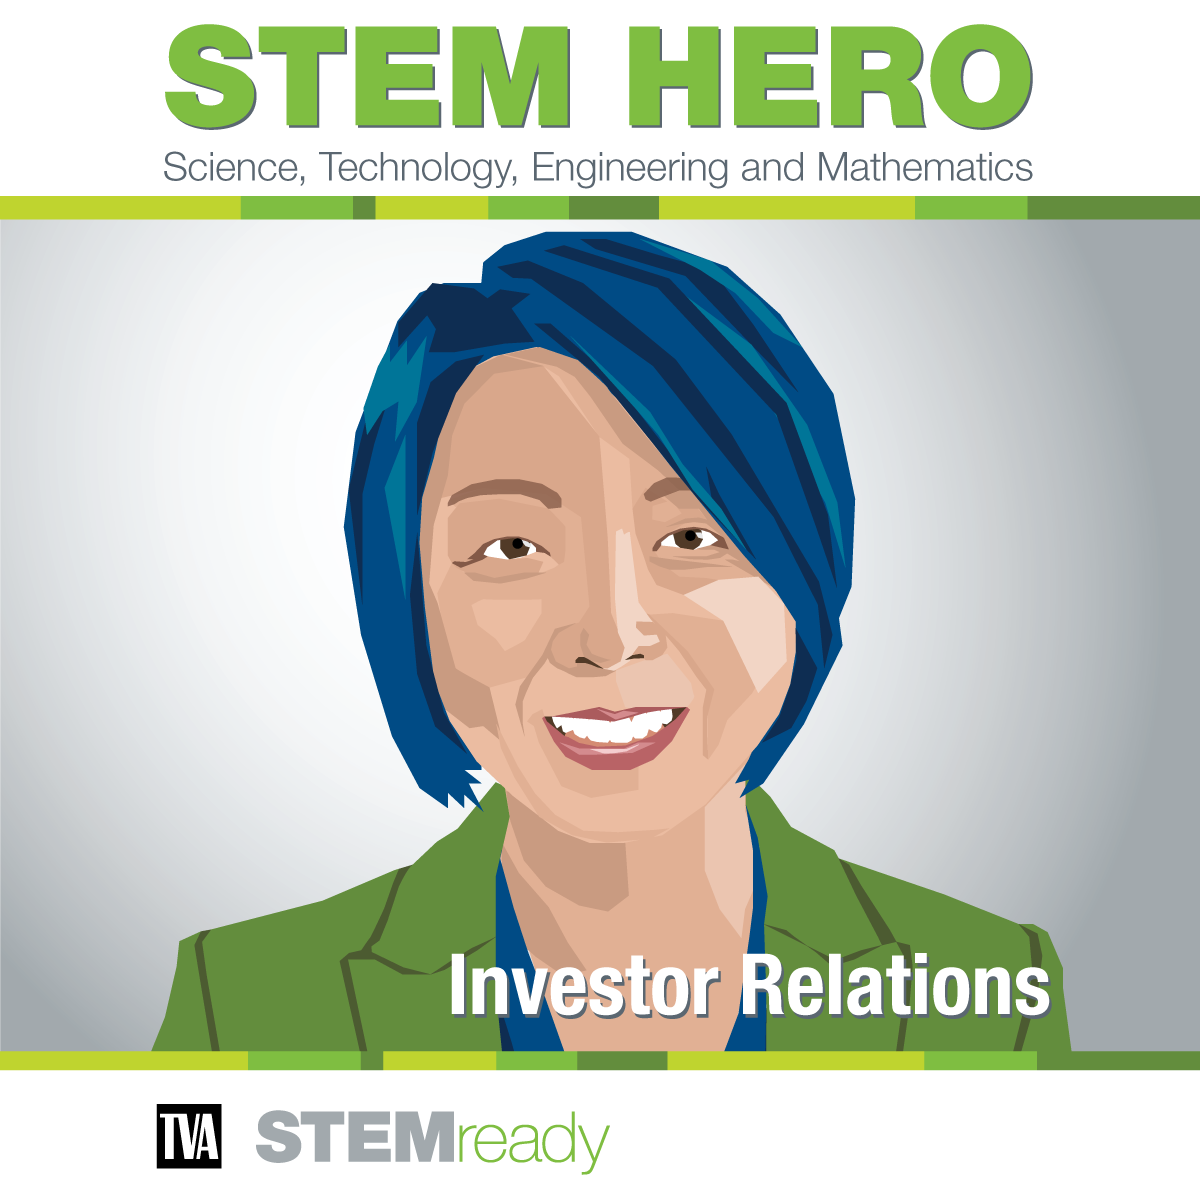 STEM HERO Investor Relations